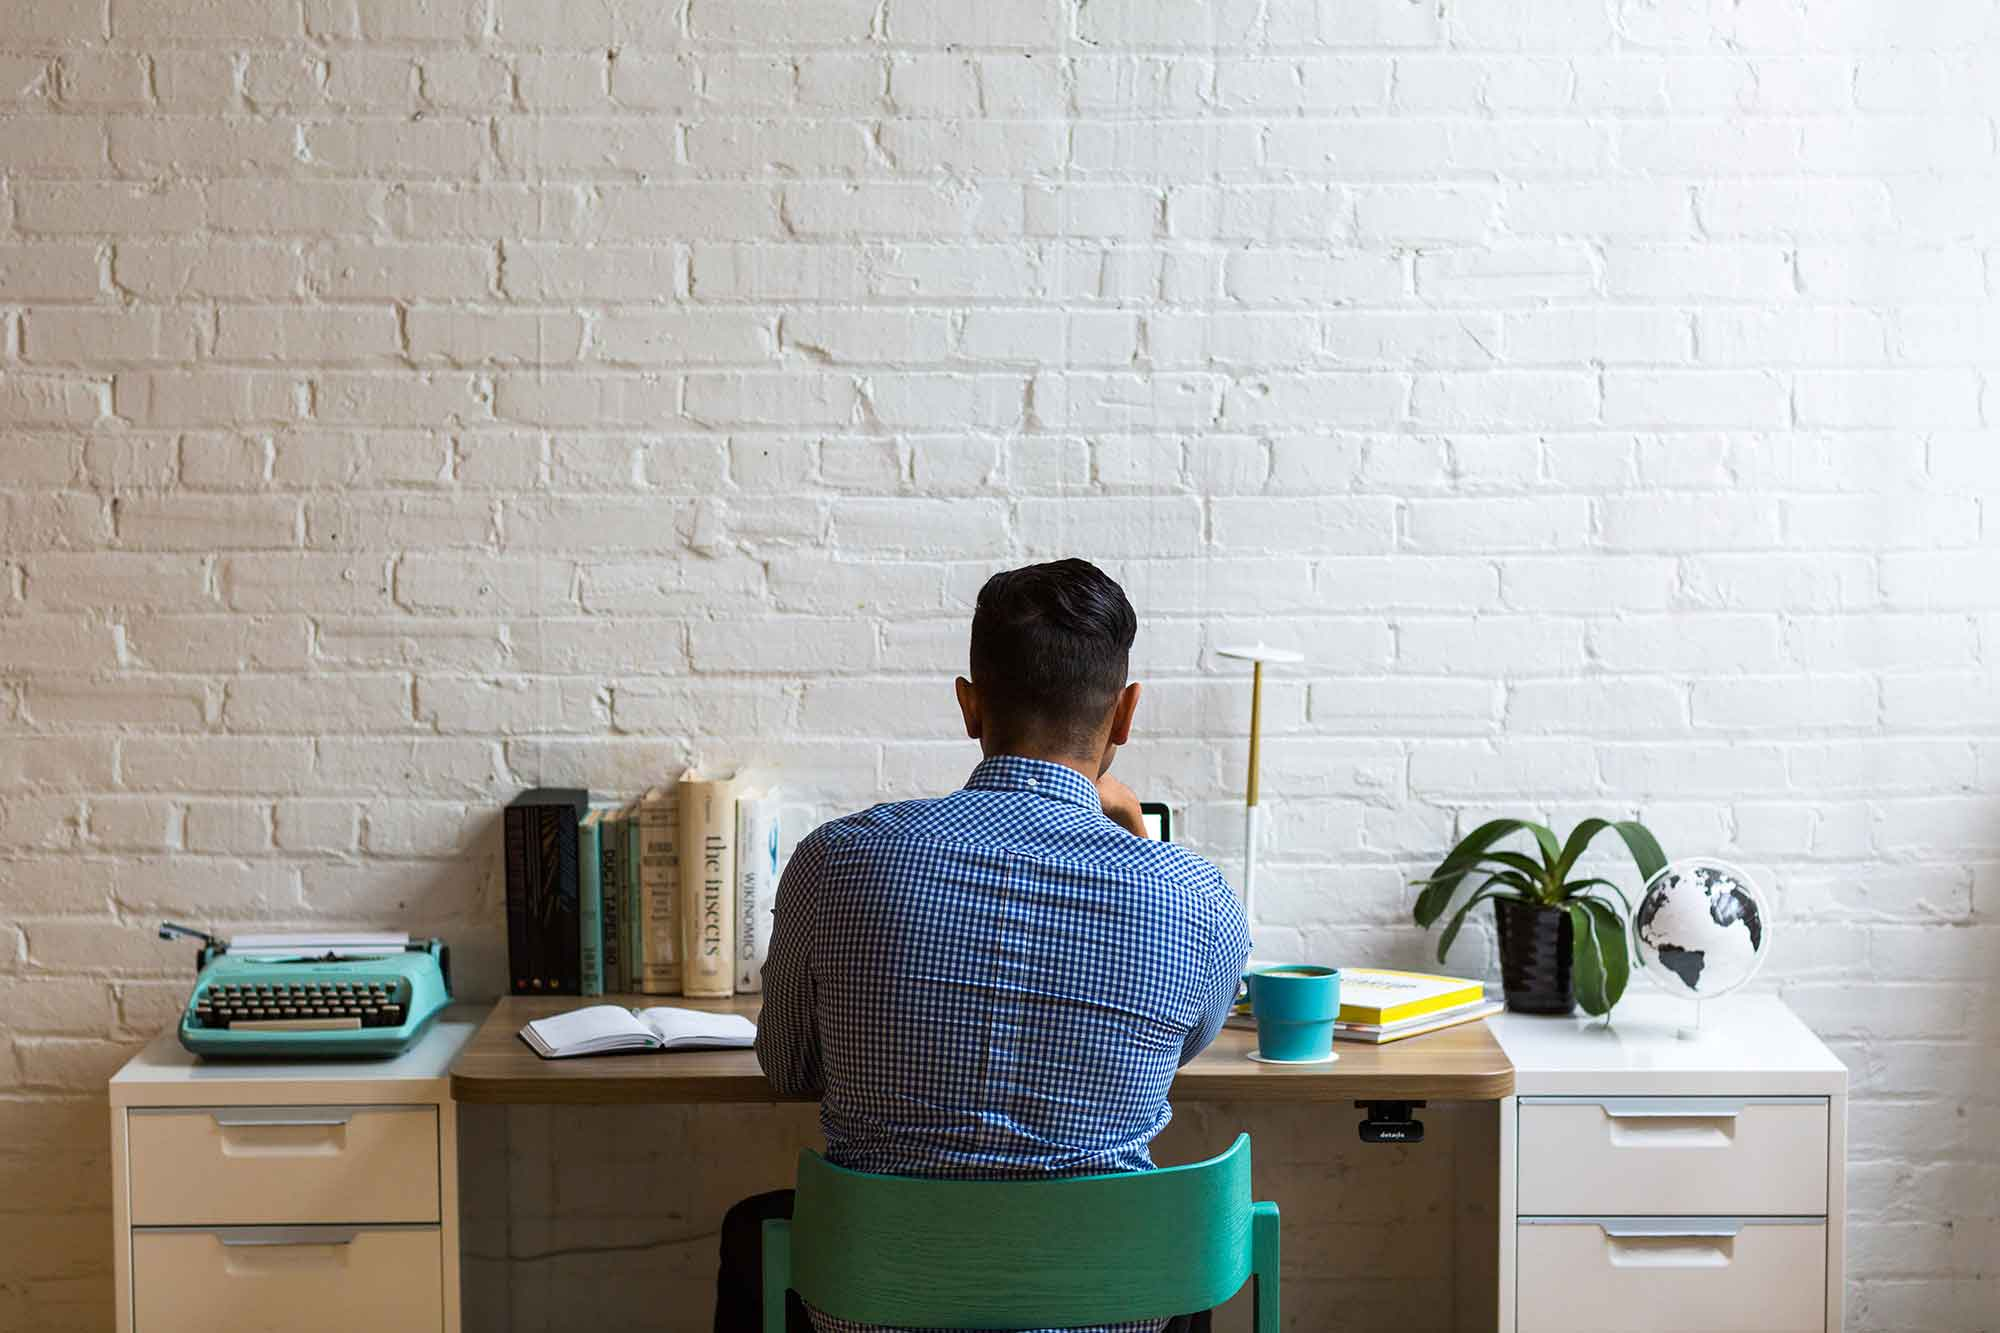 Man-at-Desk-in-White-room.jpg